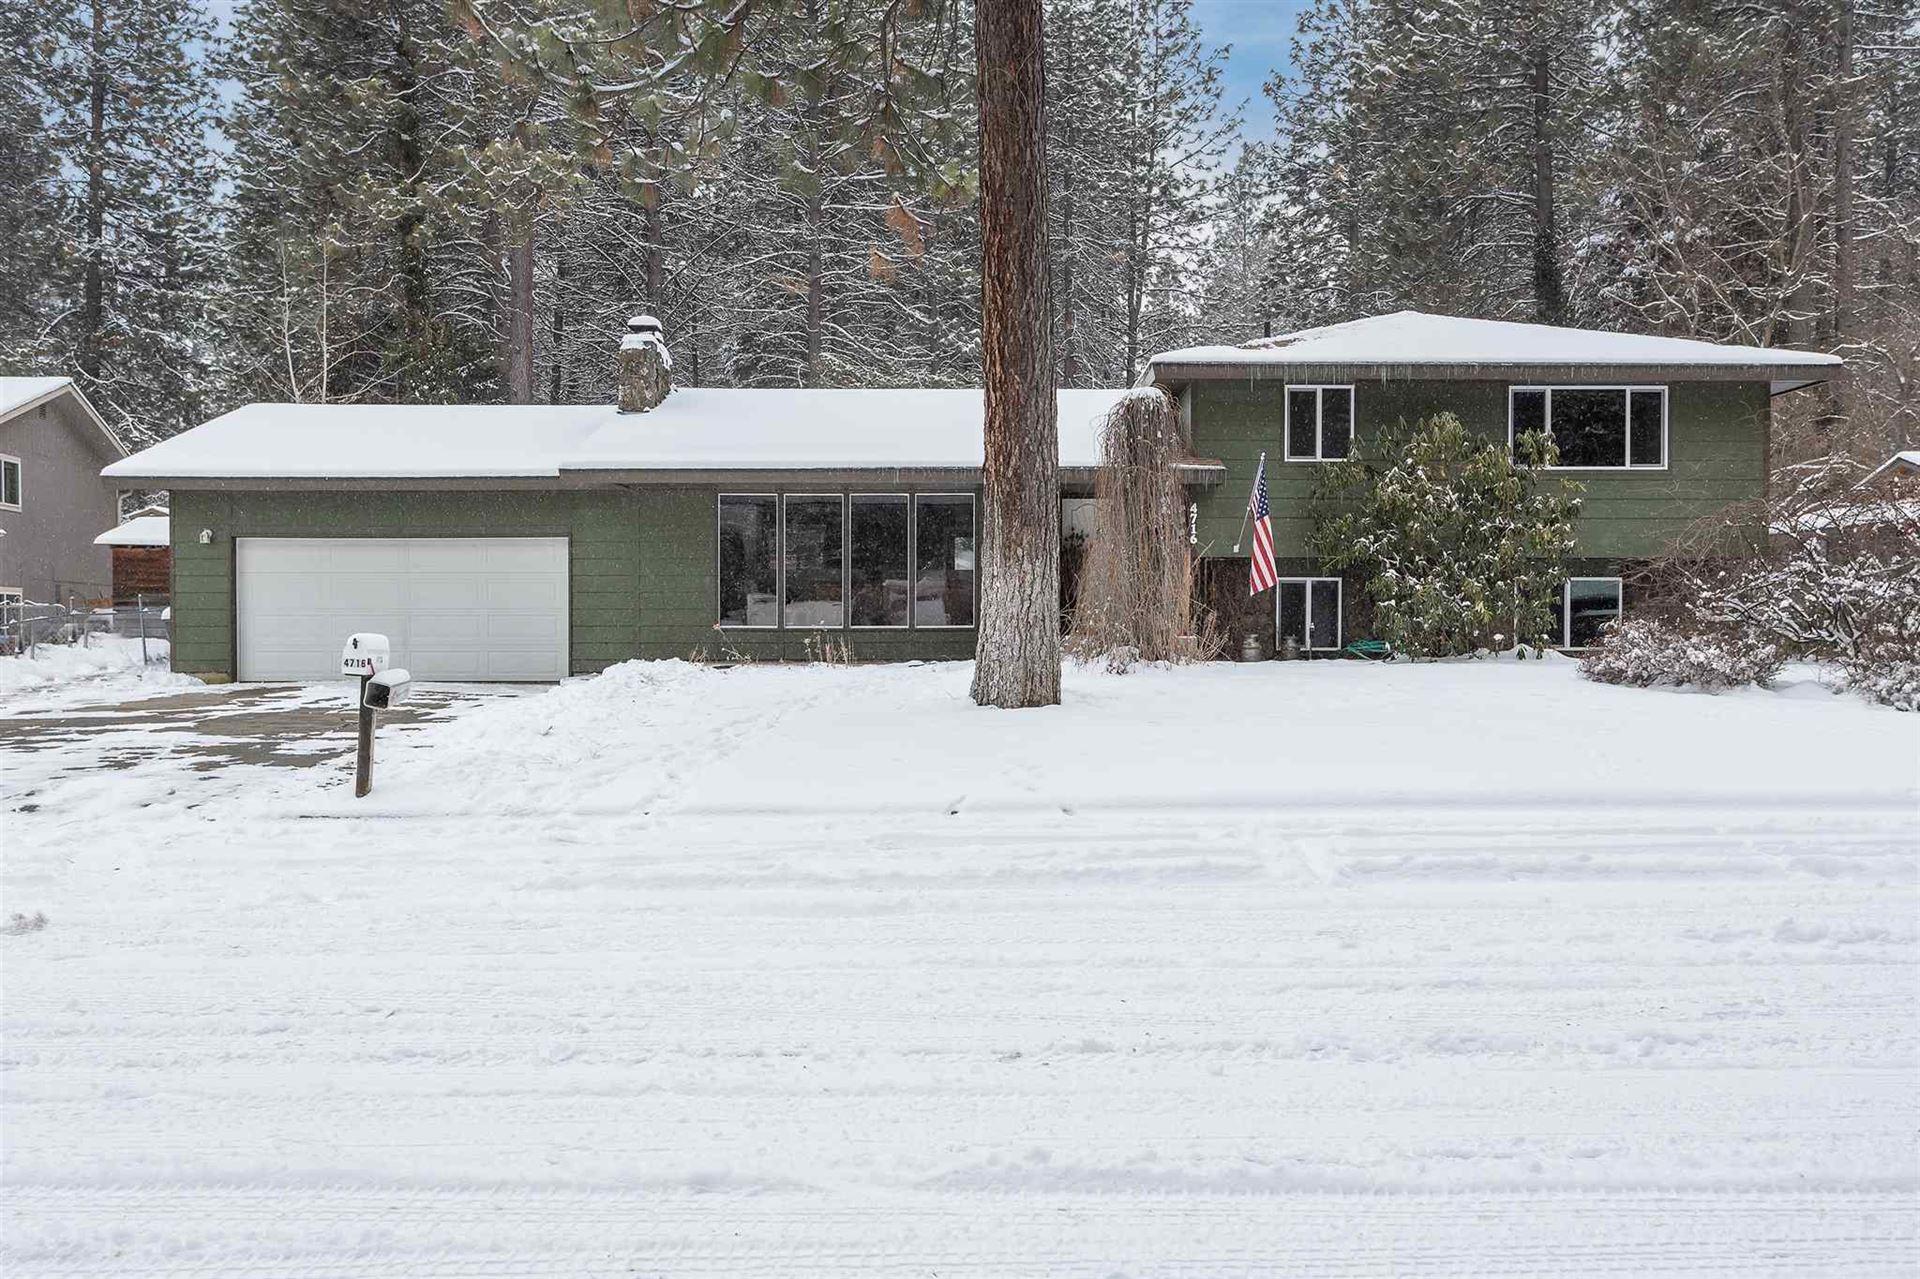 4716 S Tipaway St, Spokane Valley, WA 99206 - #: 202111626